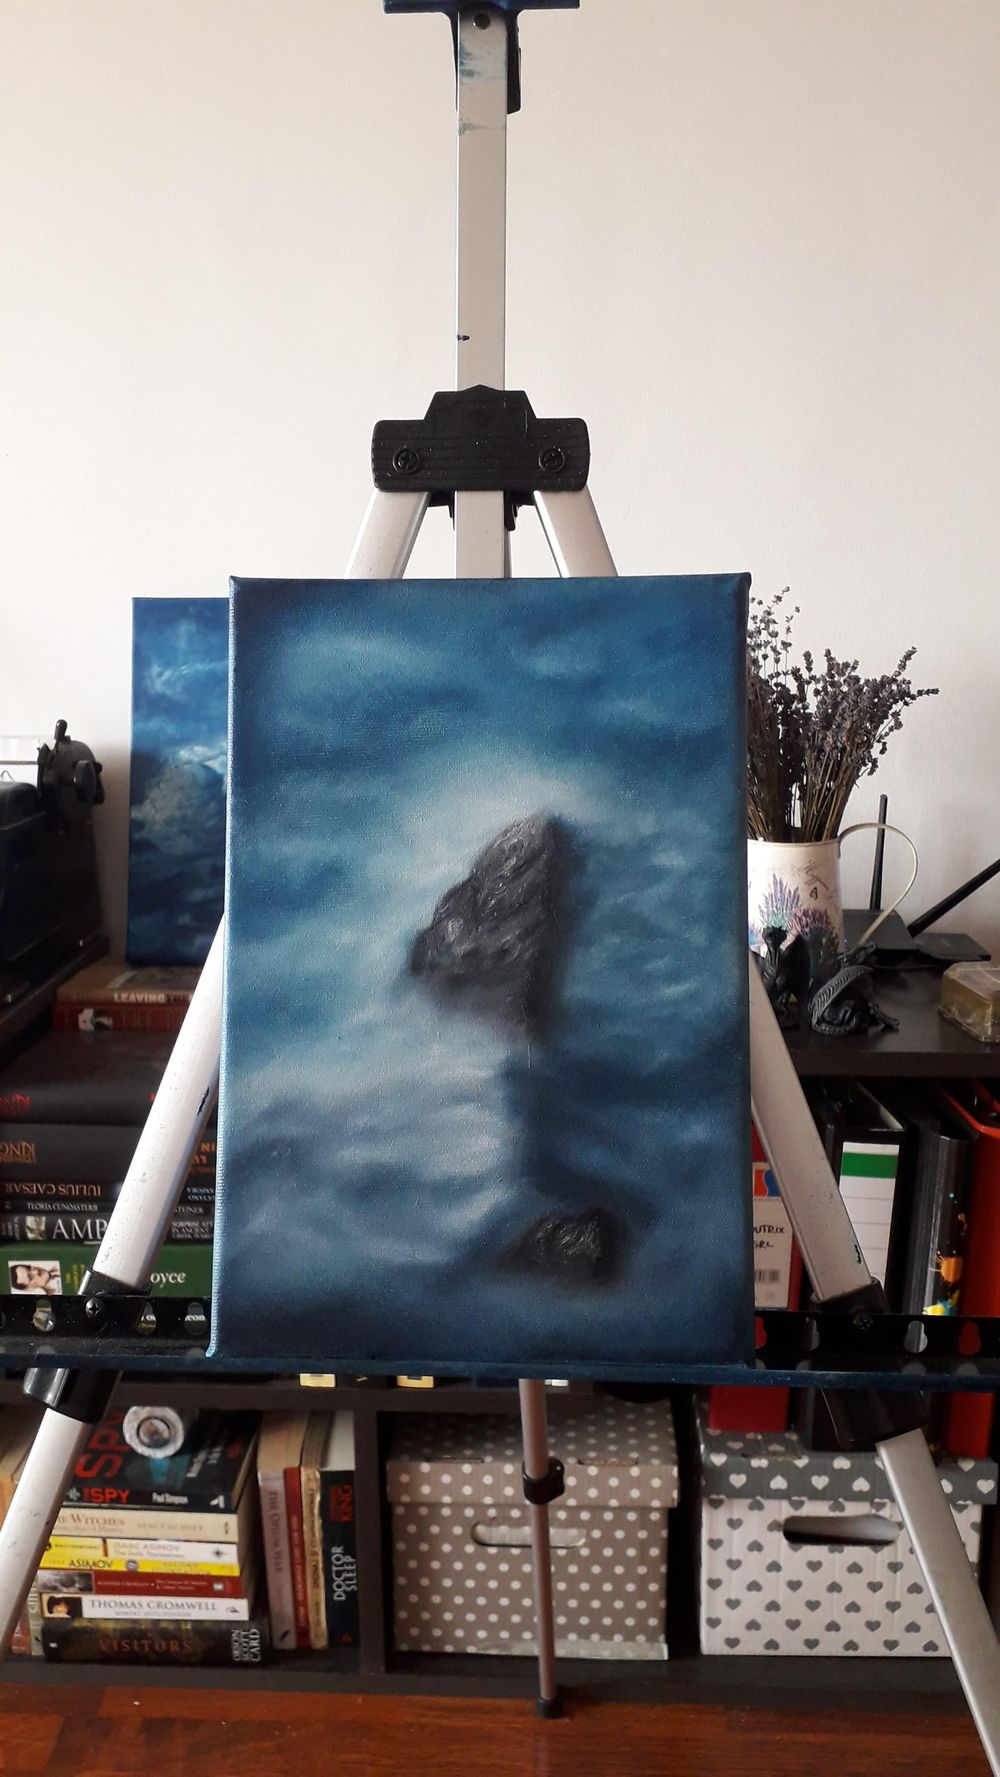 Misty Mountain Peak - image 1 - student project